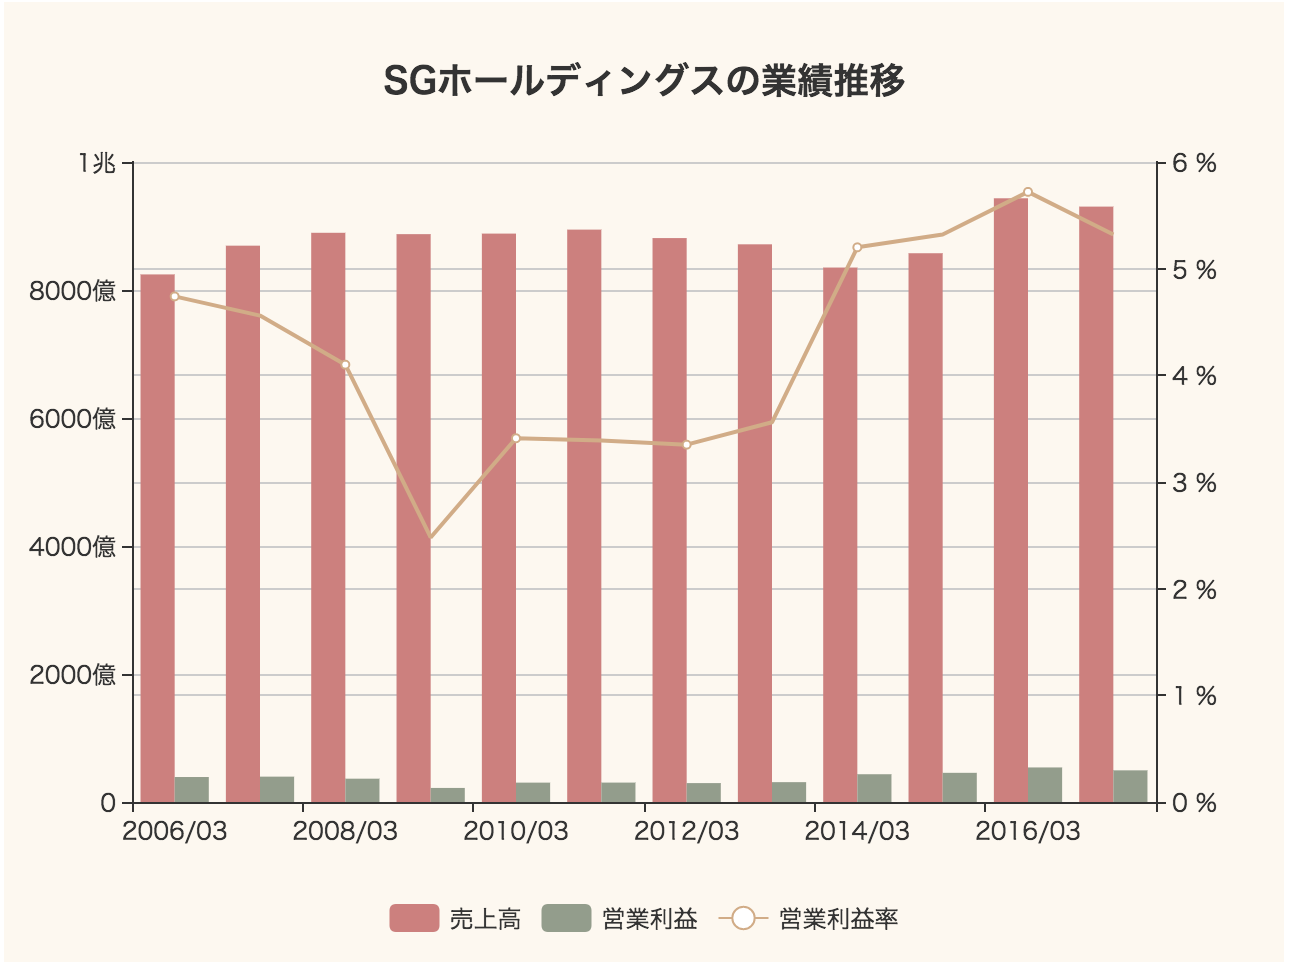 strainer「ついに上場する佐川急便(SGホールディングス)の過去11年間の事業数値まとめ」